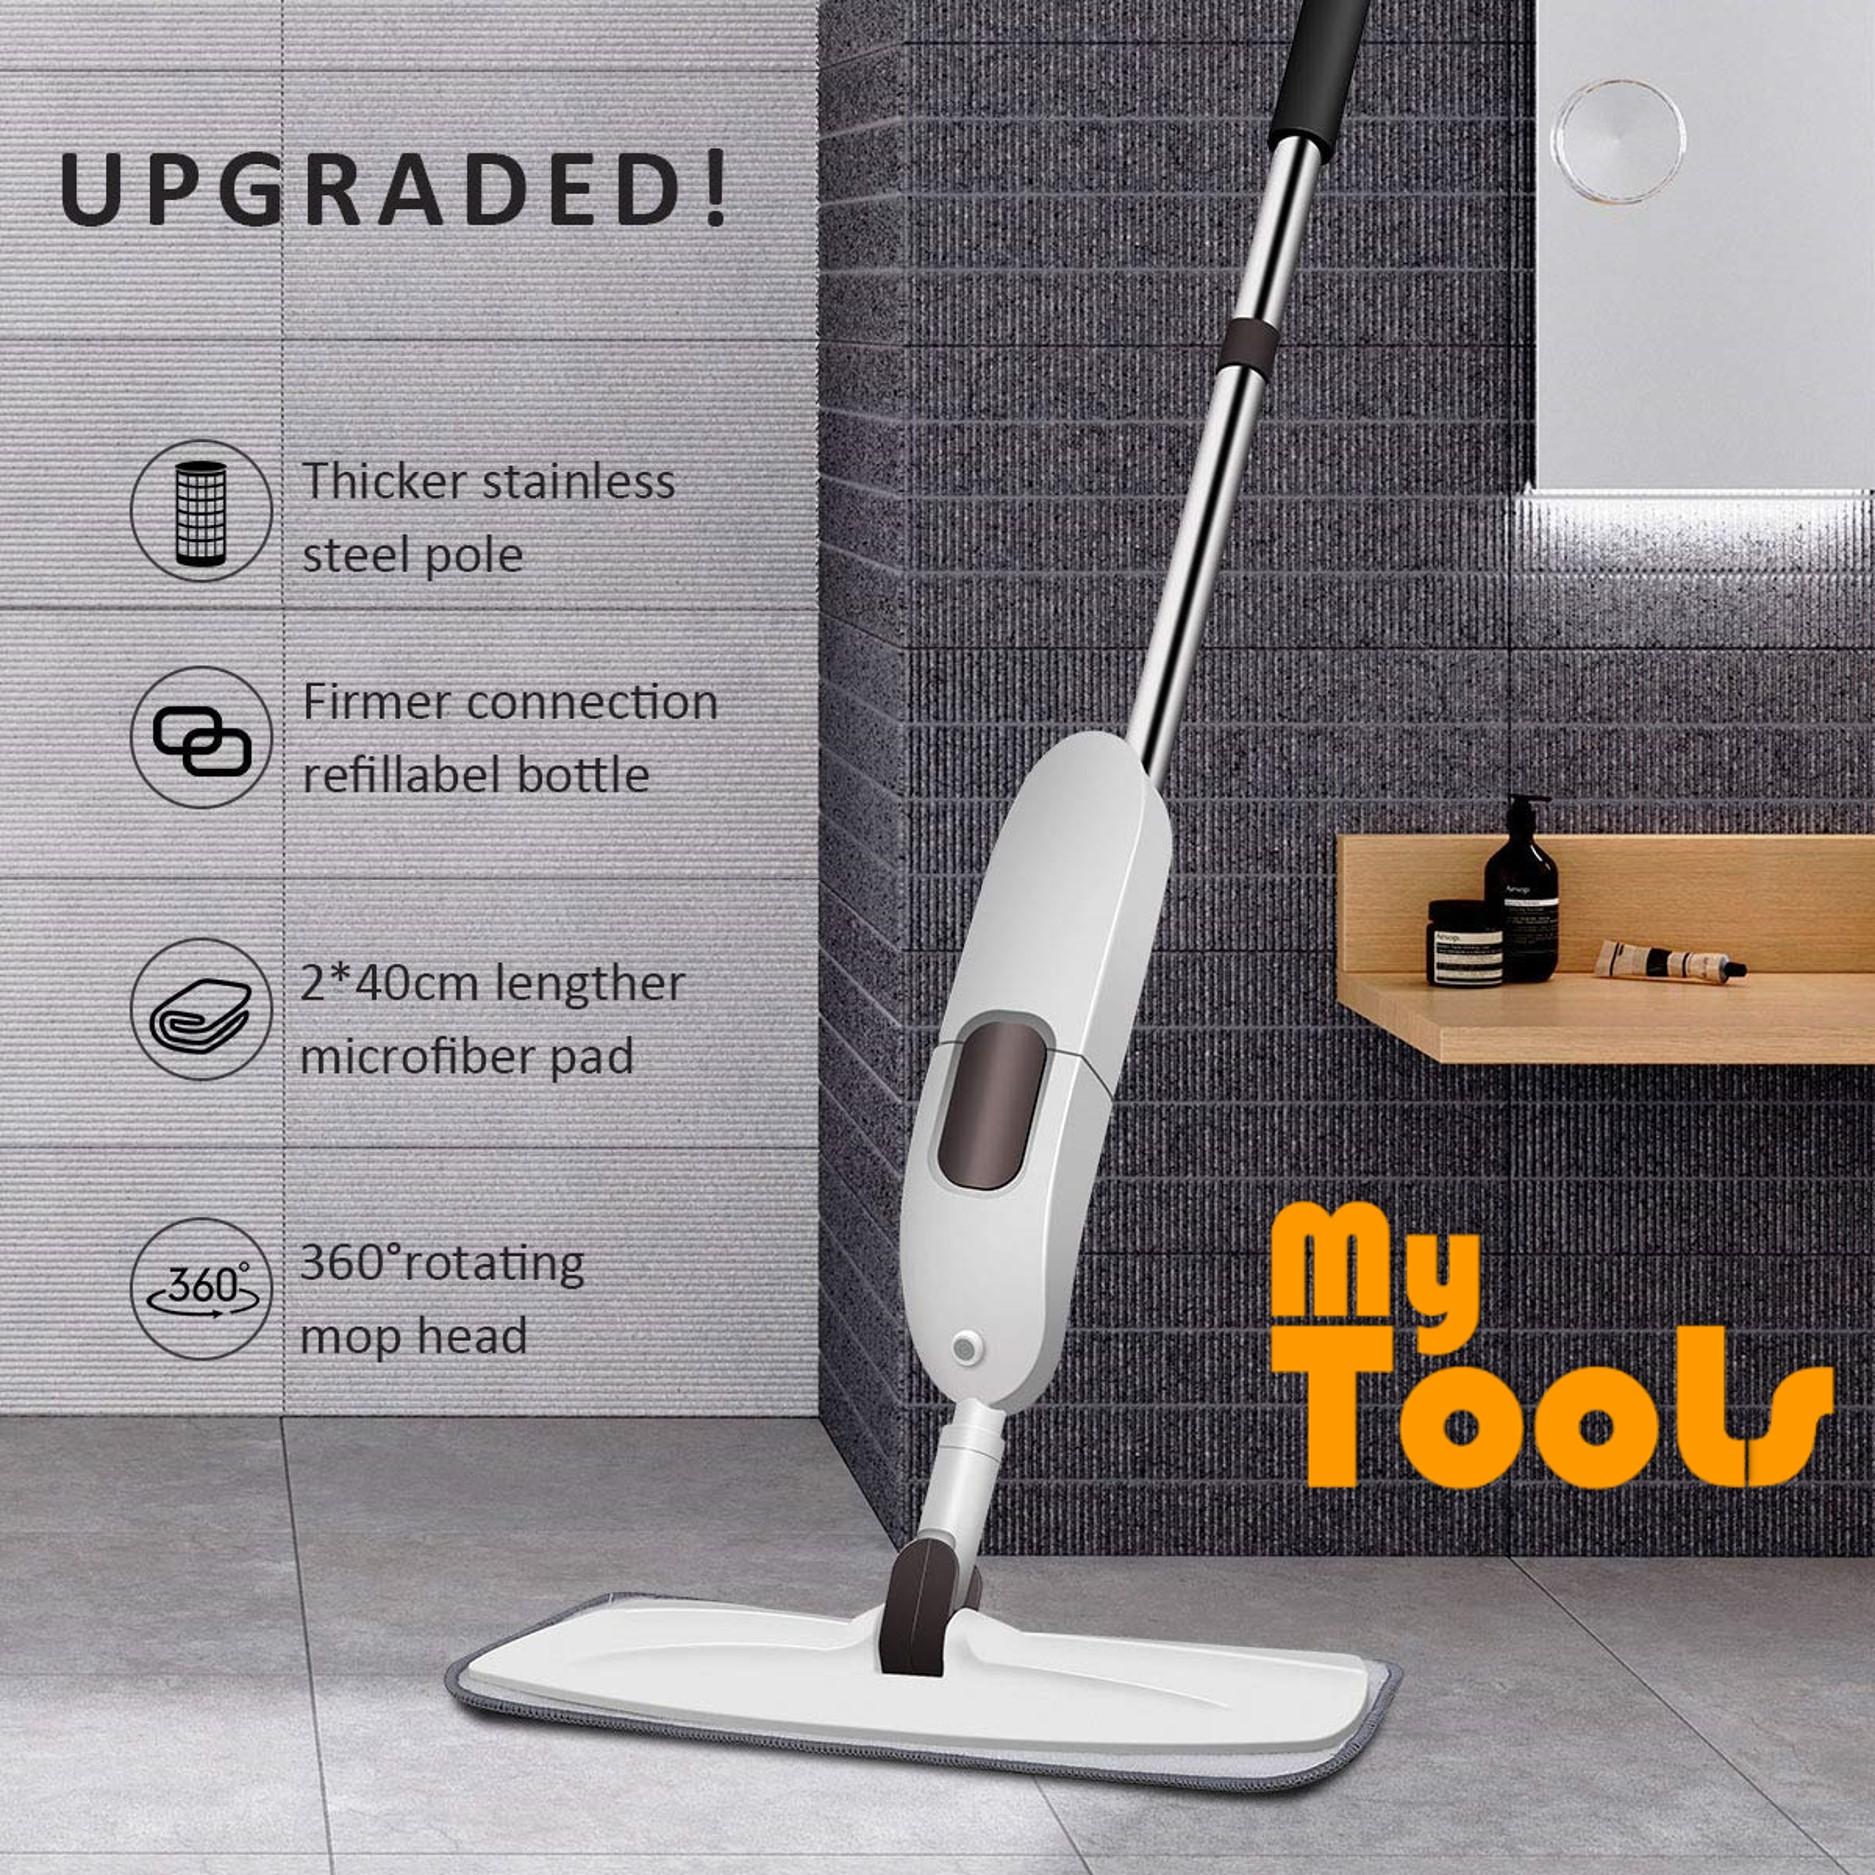 Mytools Premium Spray Mop Wet Floor Mop 600mL Watering Bottle 360° Rotating Mop Super Absorb Mircrofibre Pad